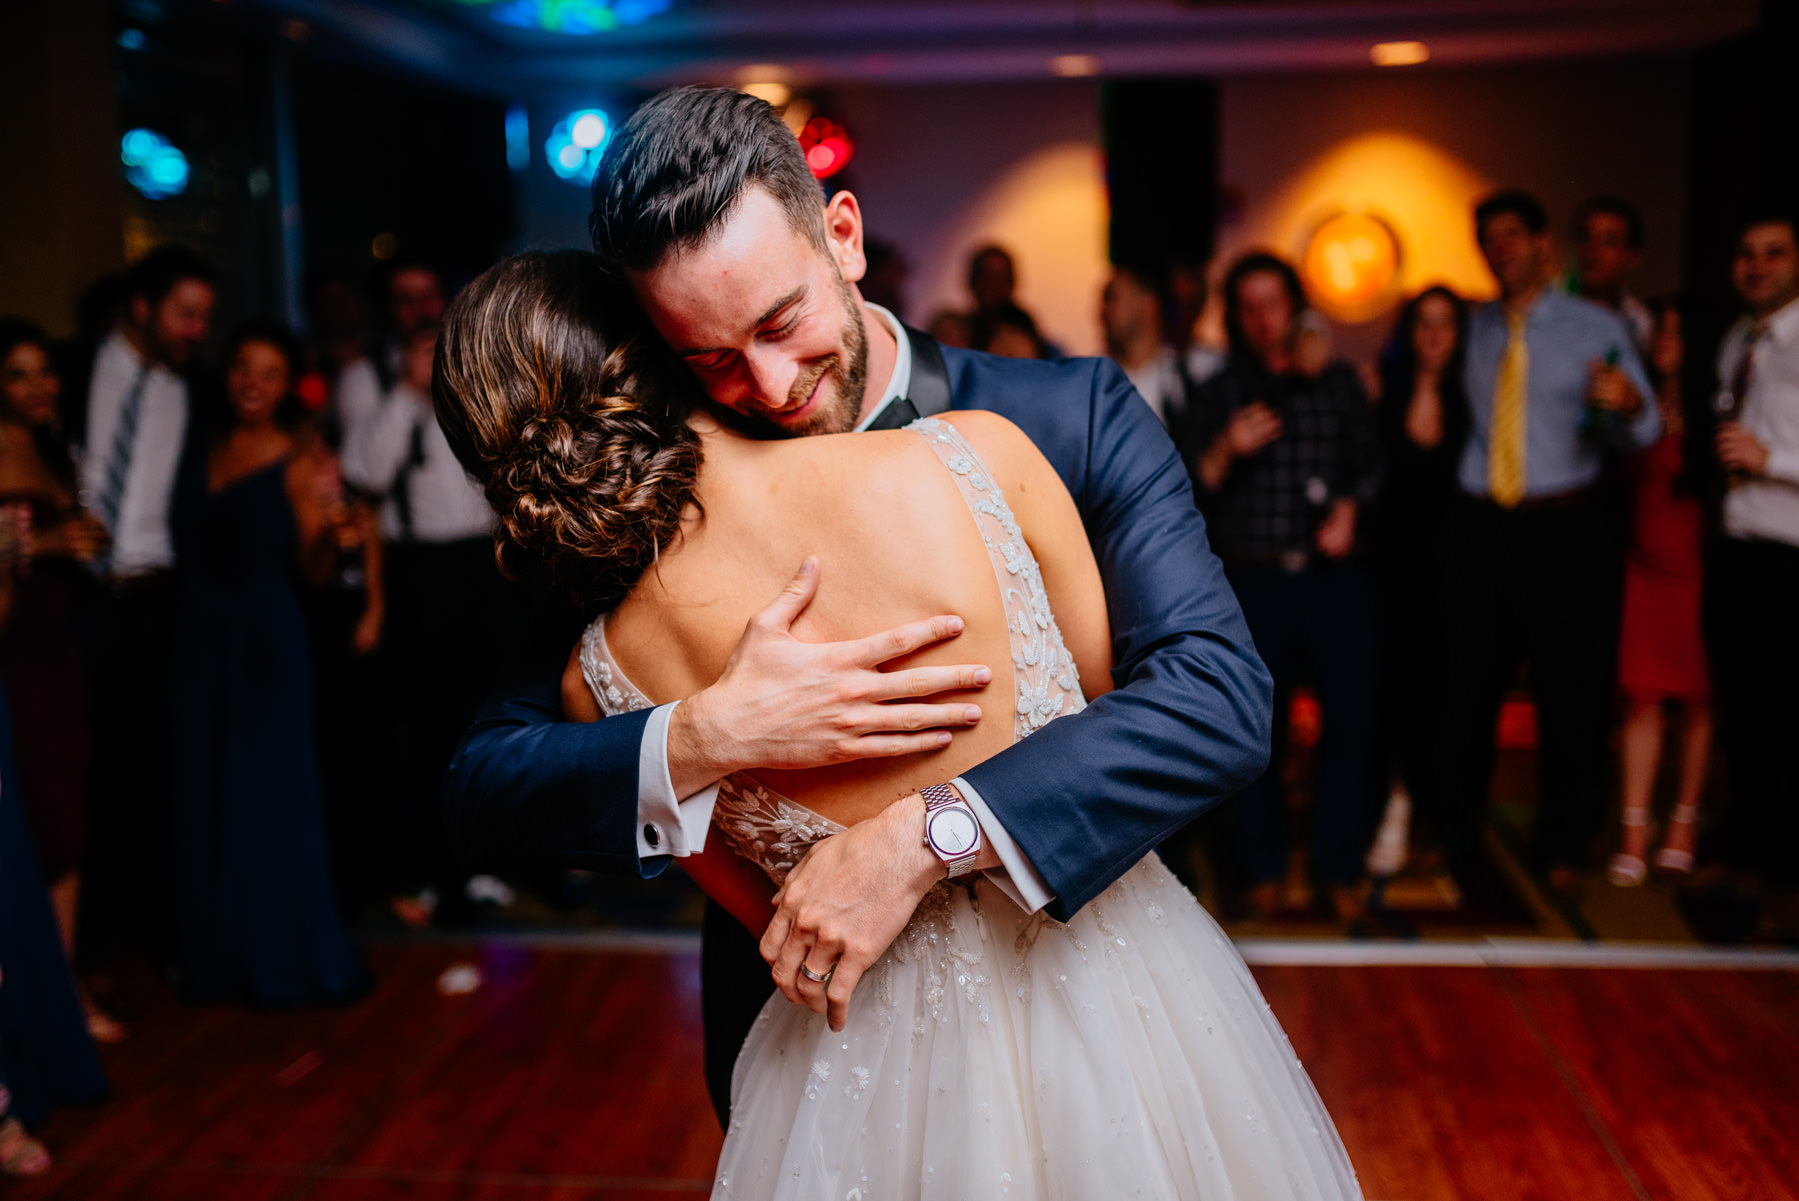 groom hugging bride during reception